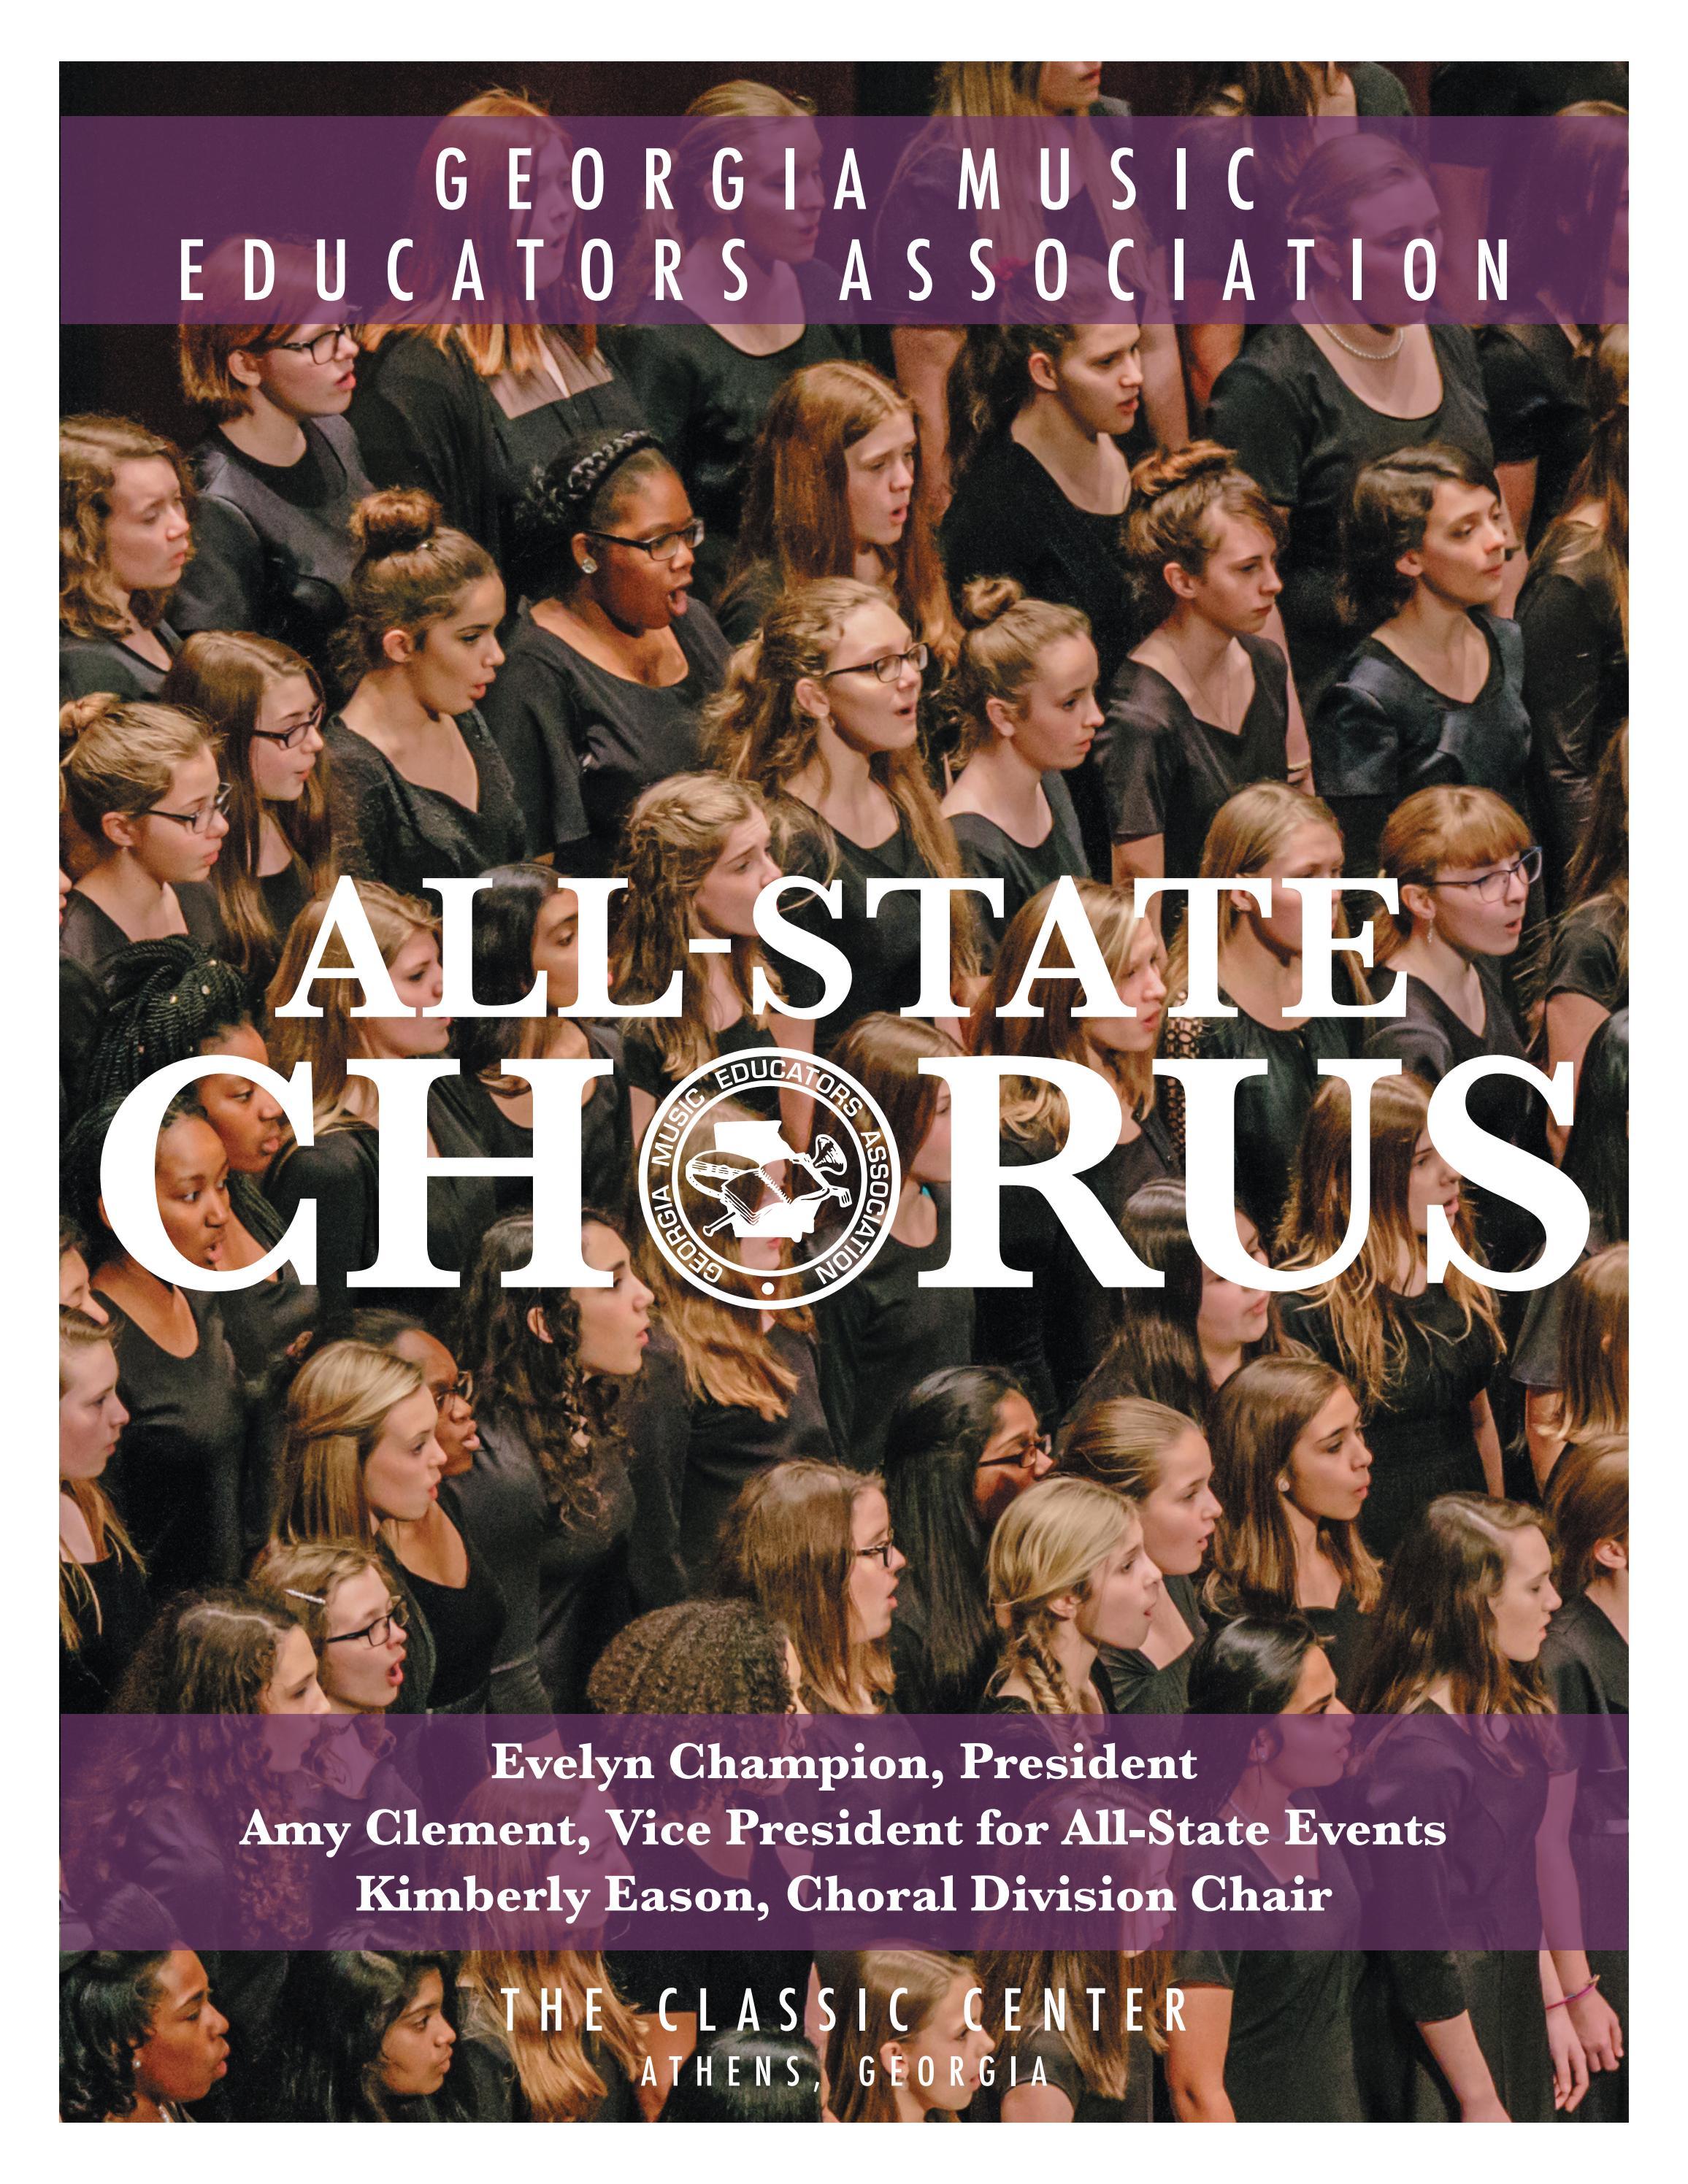 2018 GMEA All-State Chorus Program by Georgia Music Educators